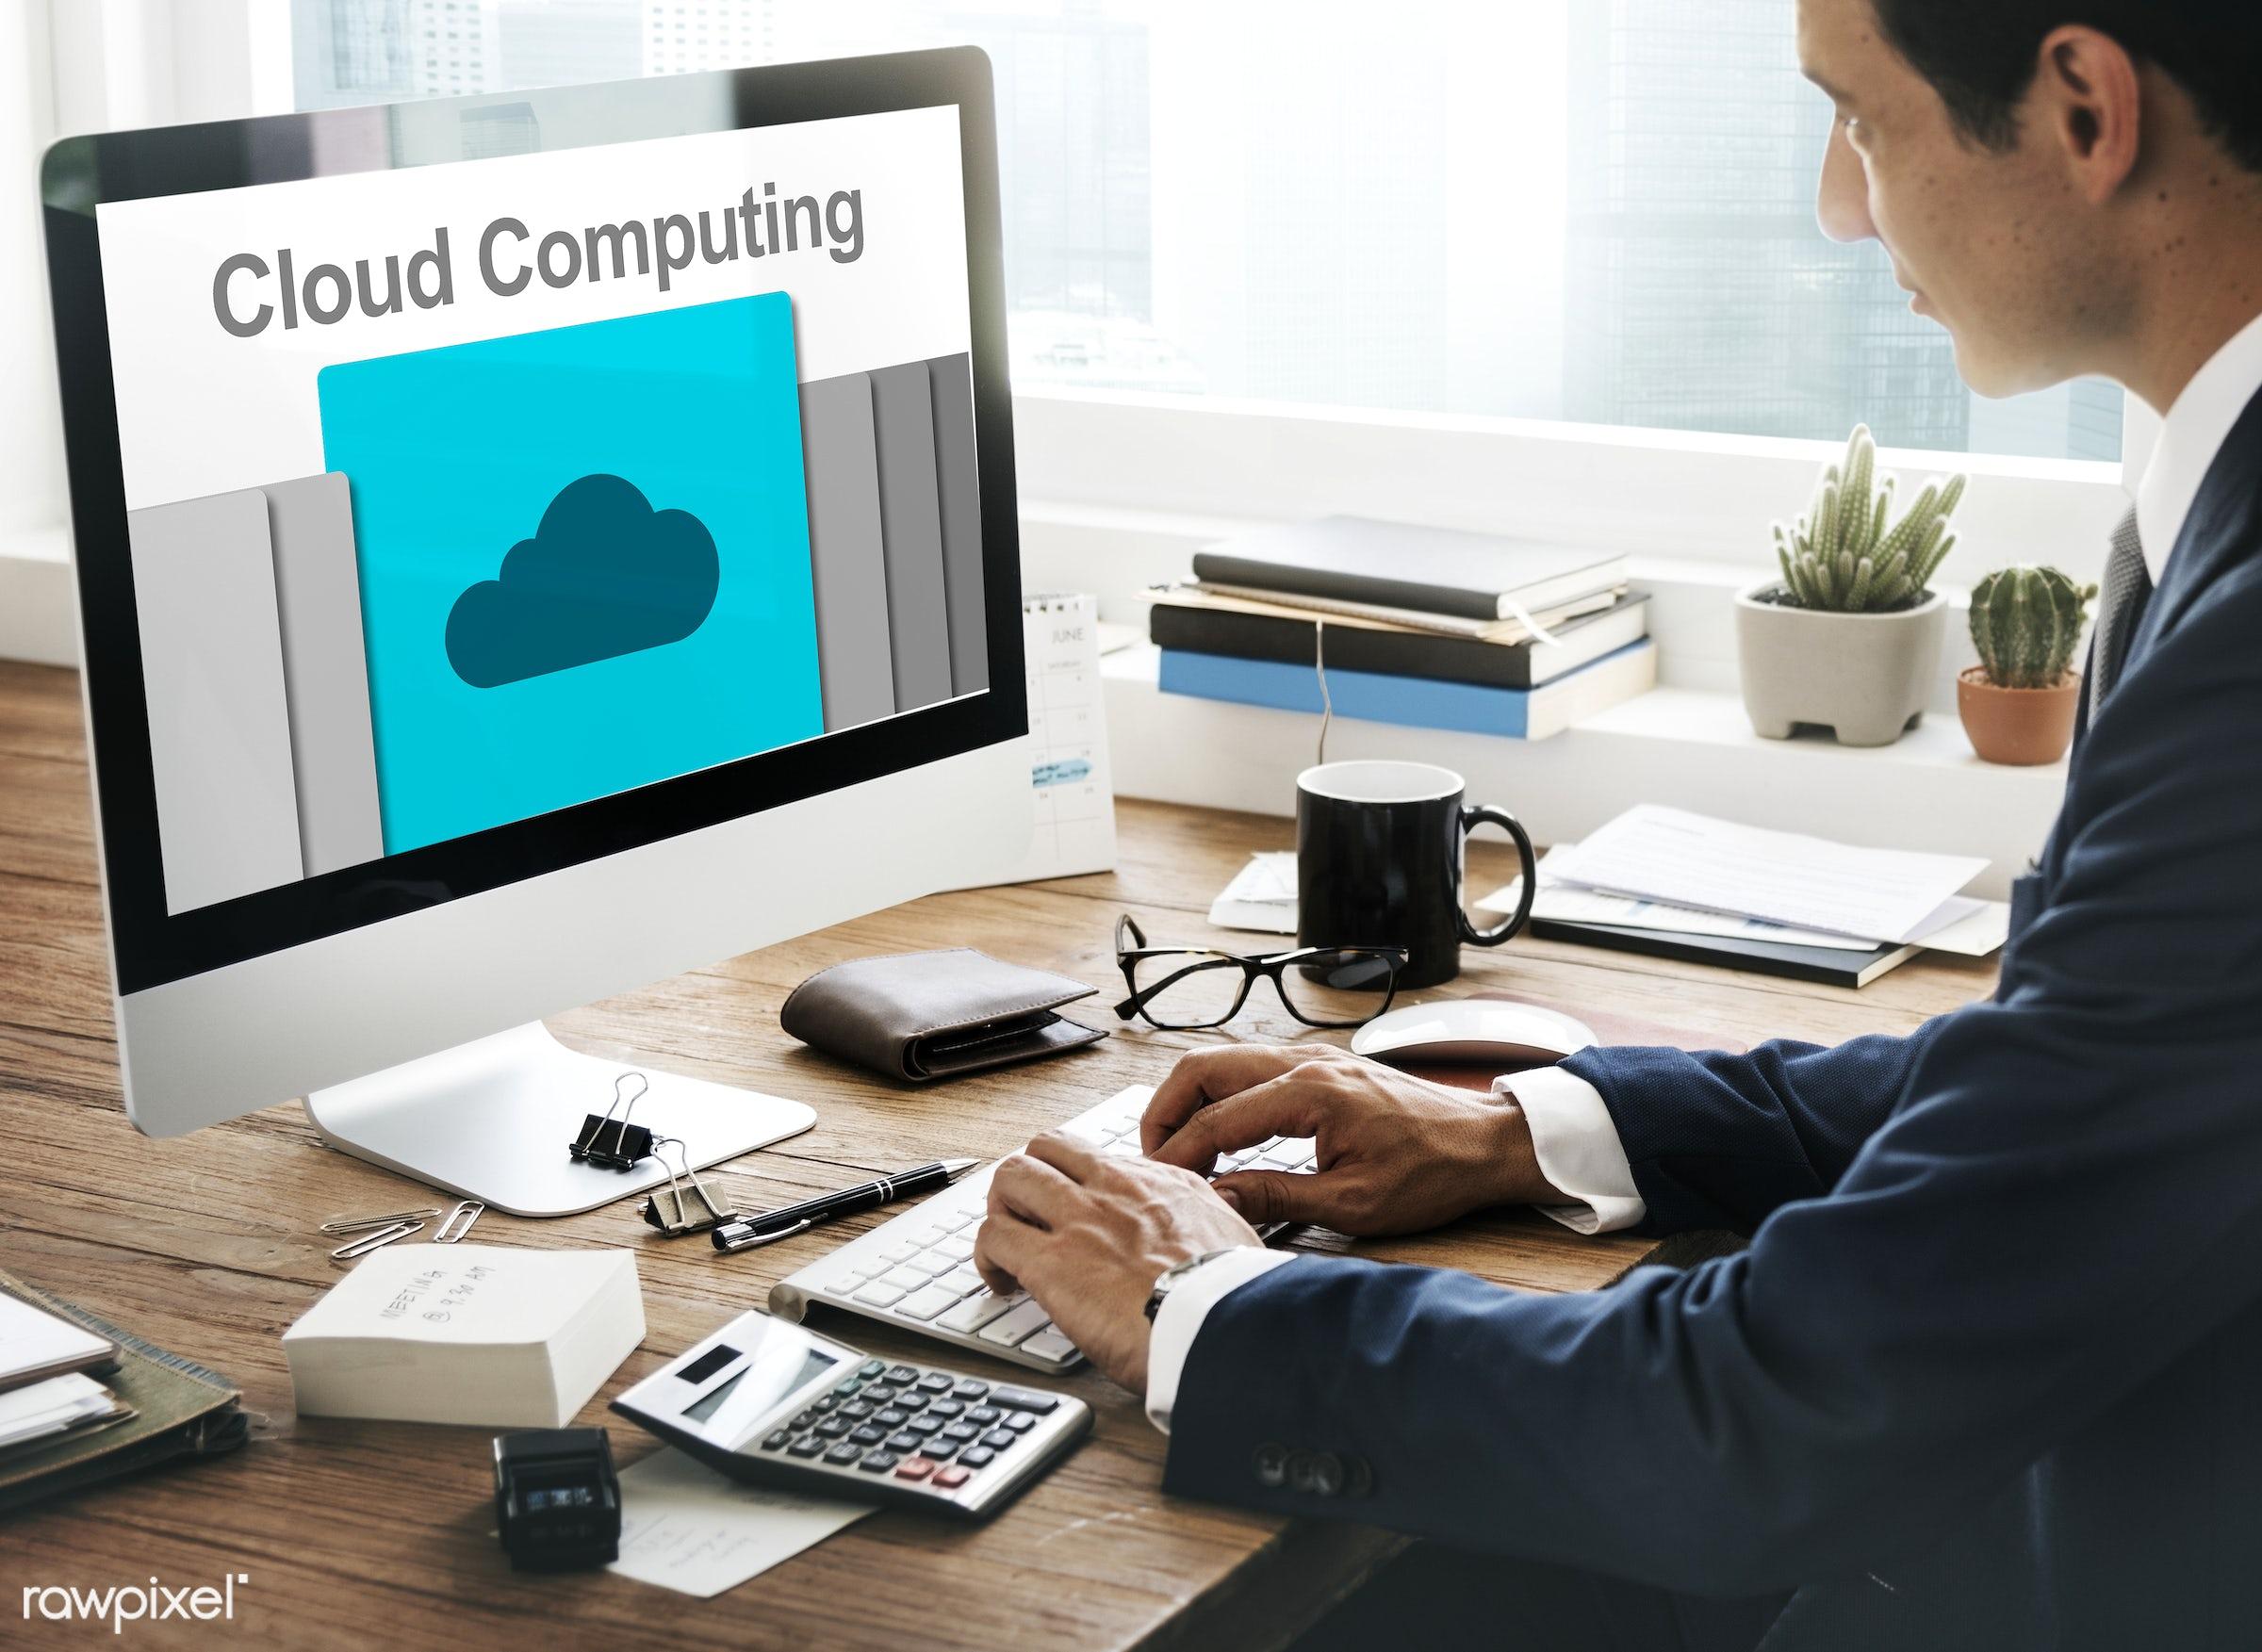 browse, business, business person, business plan, businessman, cloud computing, cloud network, communication, computer,...